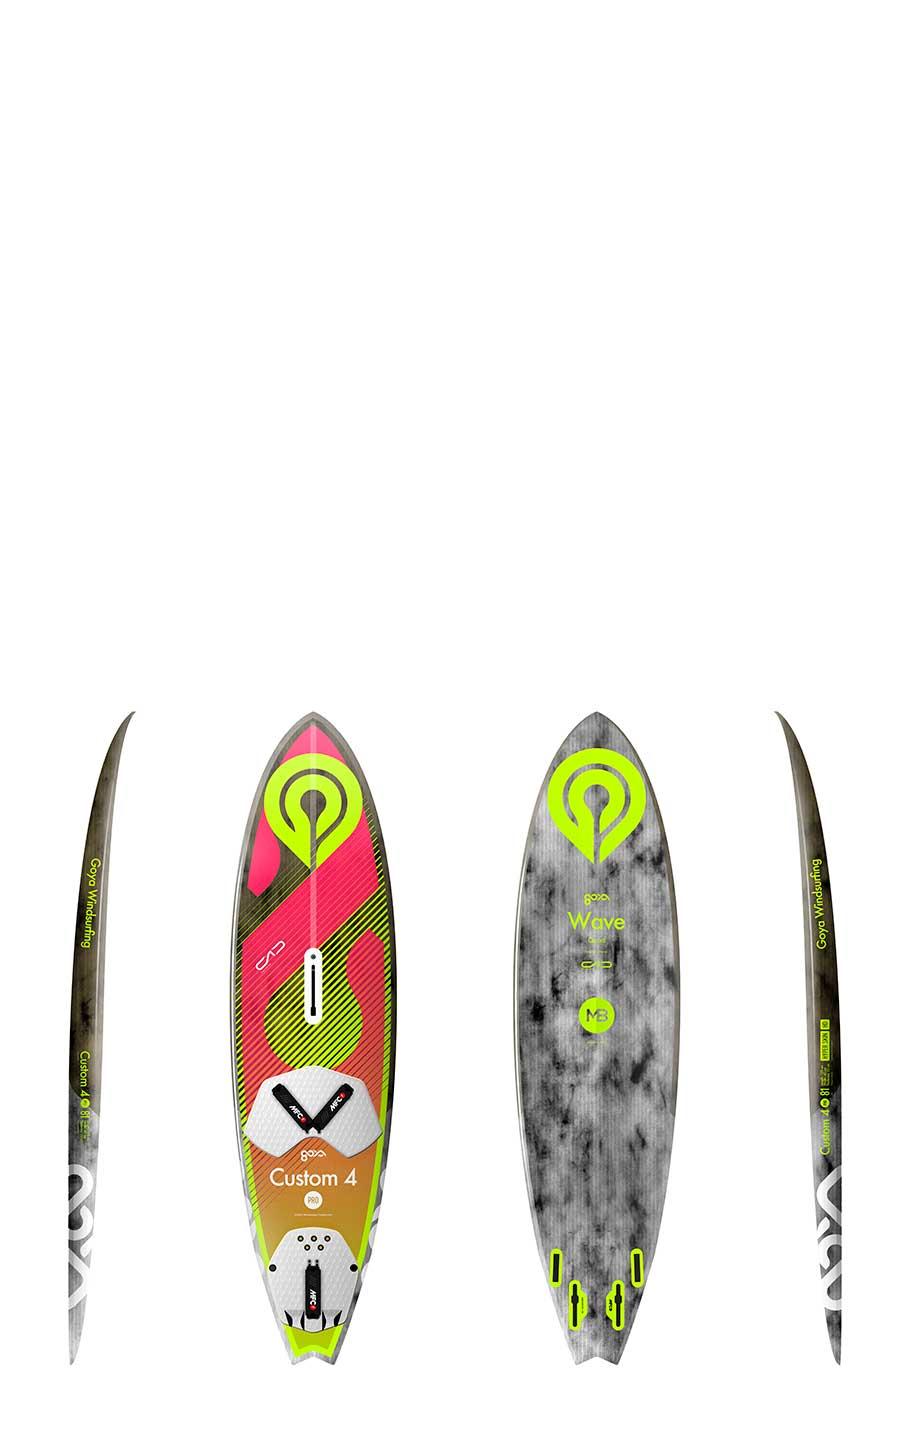 Goya Windsurfing Boards